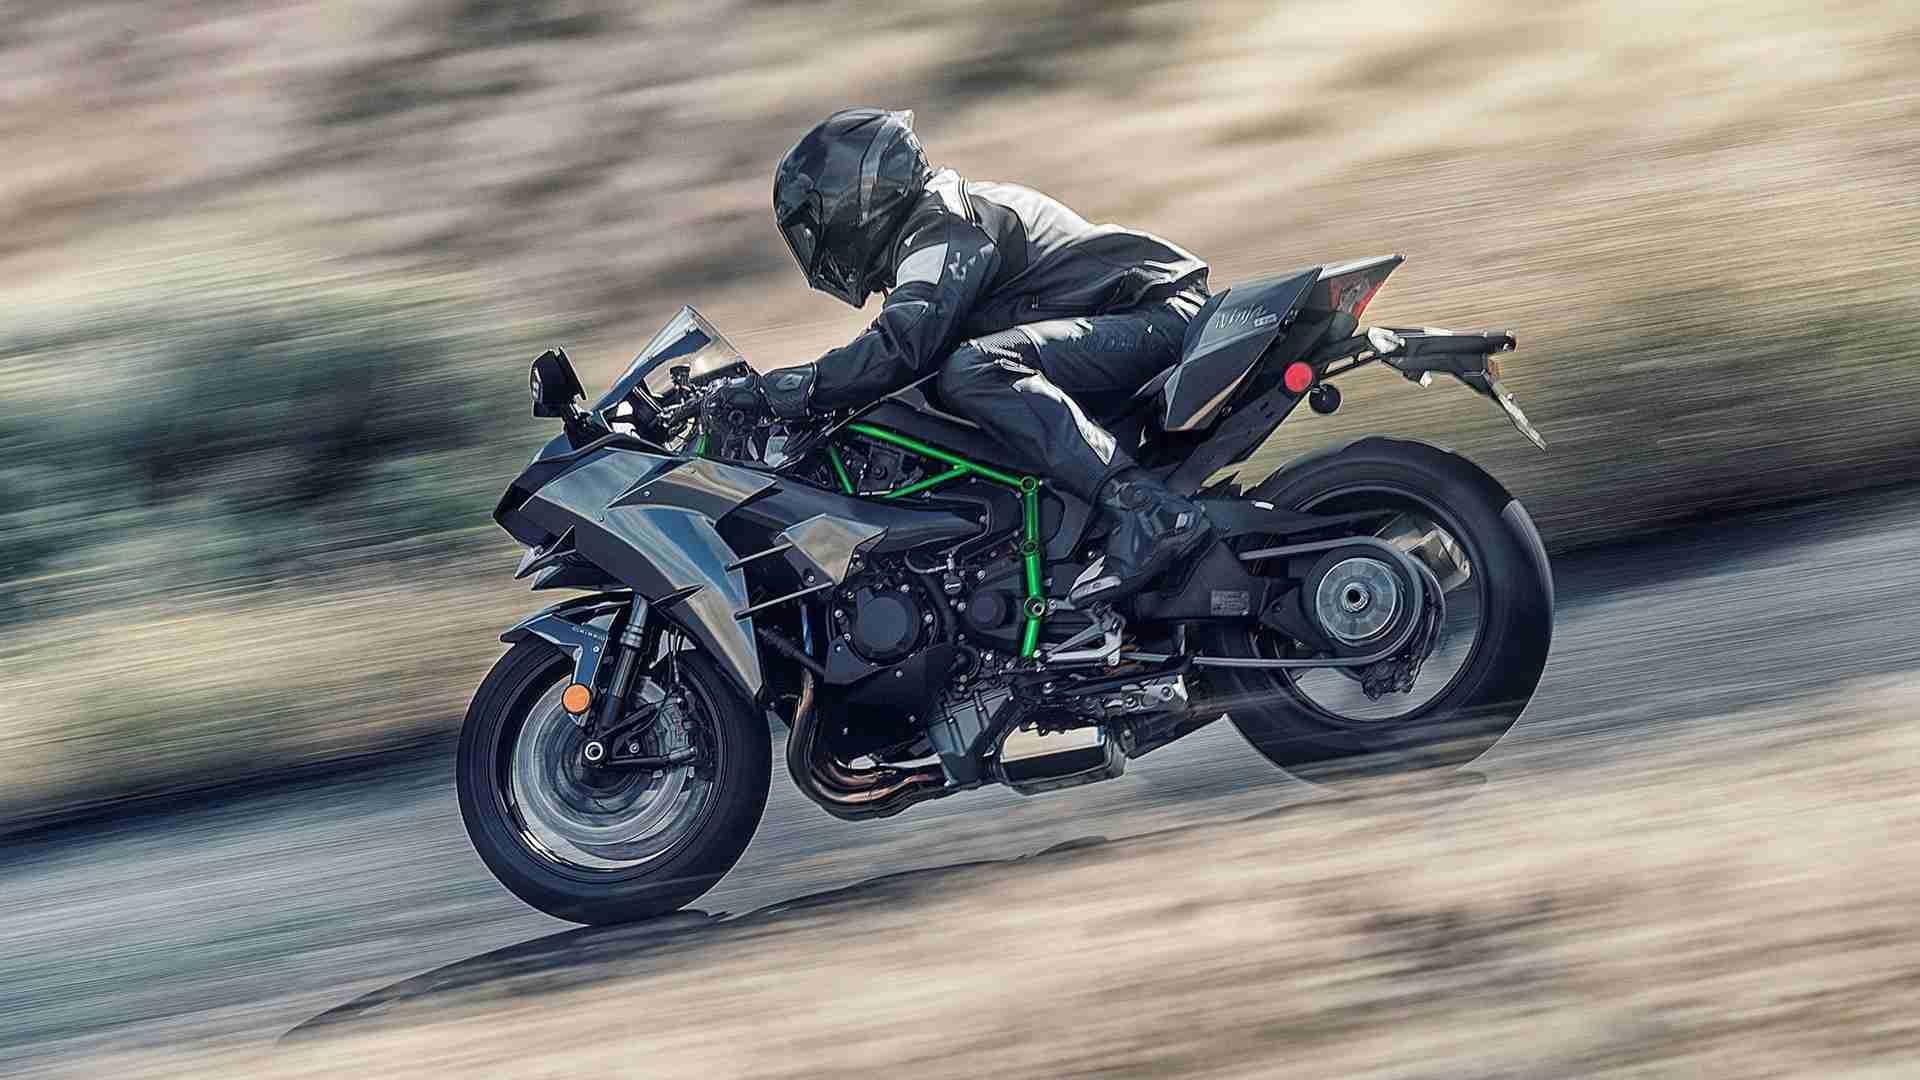 Kawasaki Ninja H2 Hd Wallpaper Iamabiker Everything Motorcycle